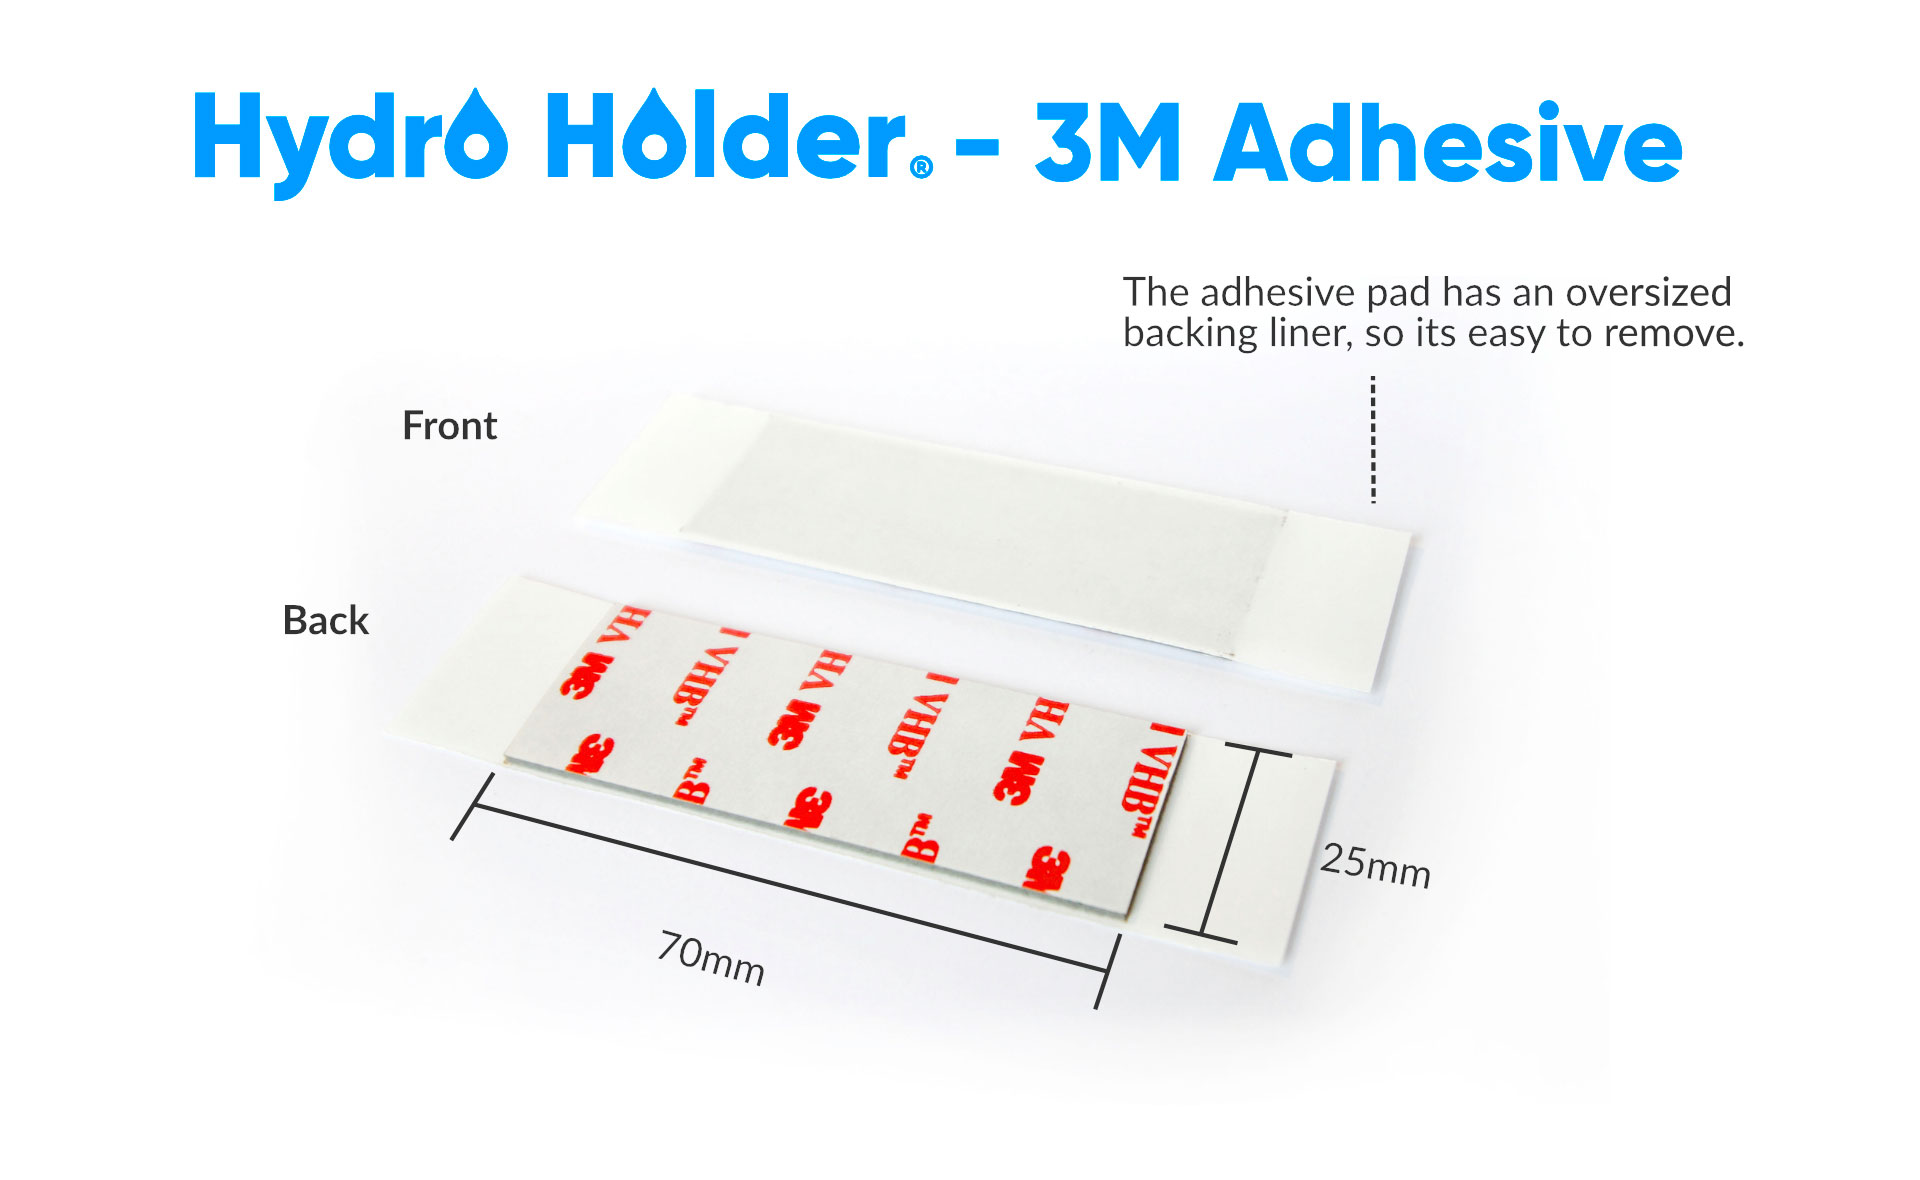 Hydro-Holder---Adhesive-Pad-3M-Single